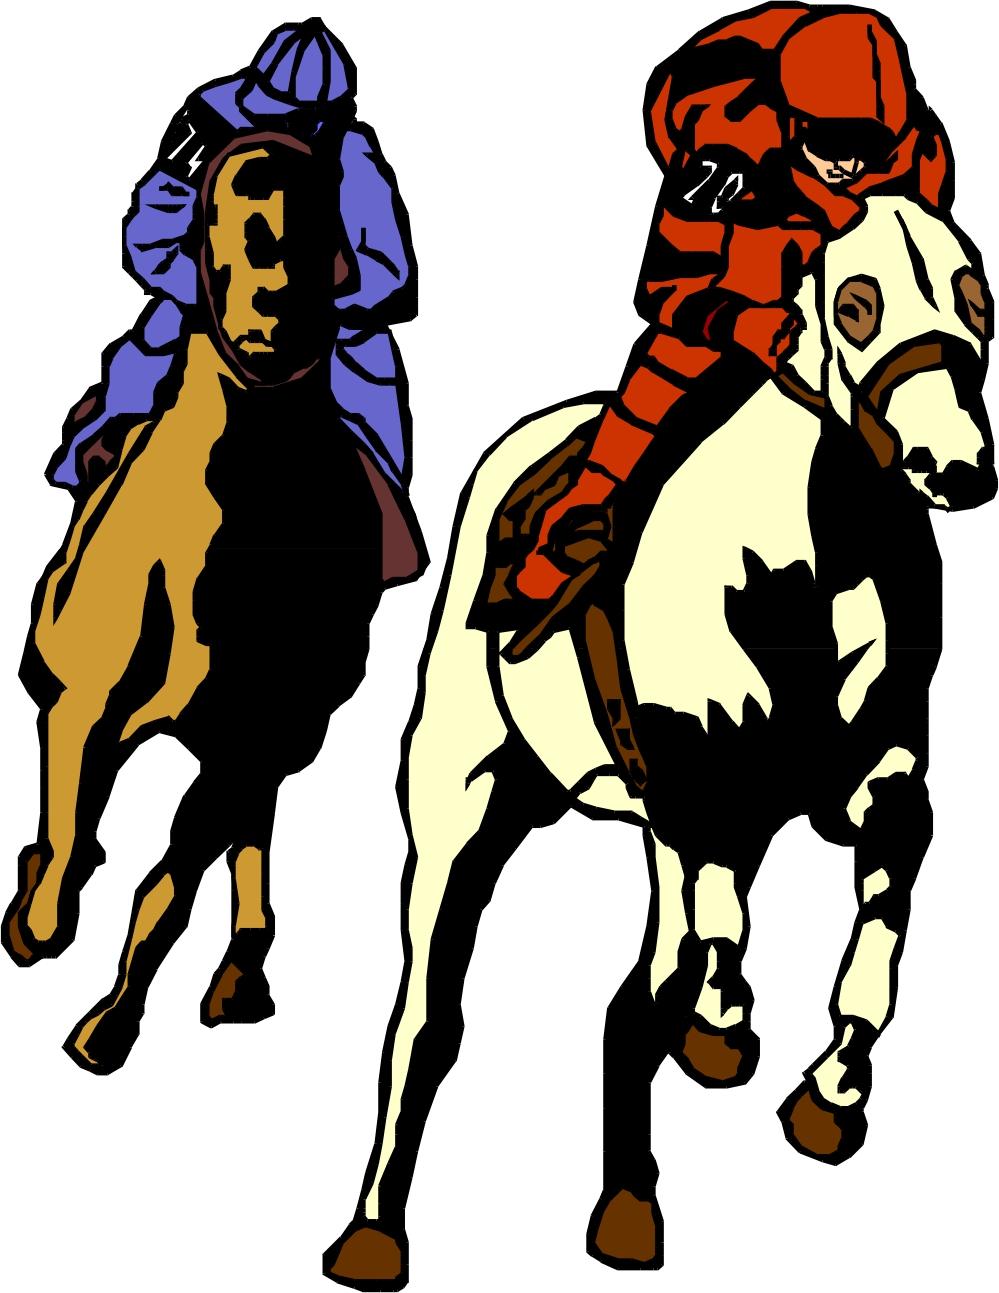 Race Horse Racing Clip Art N23 free image.